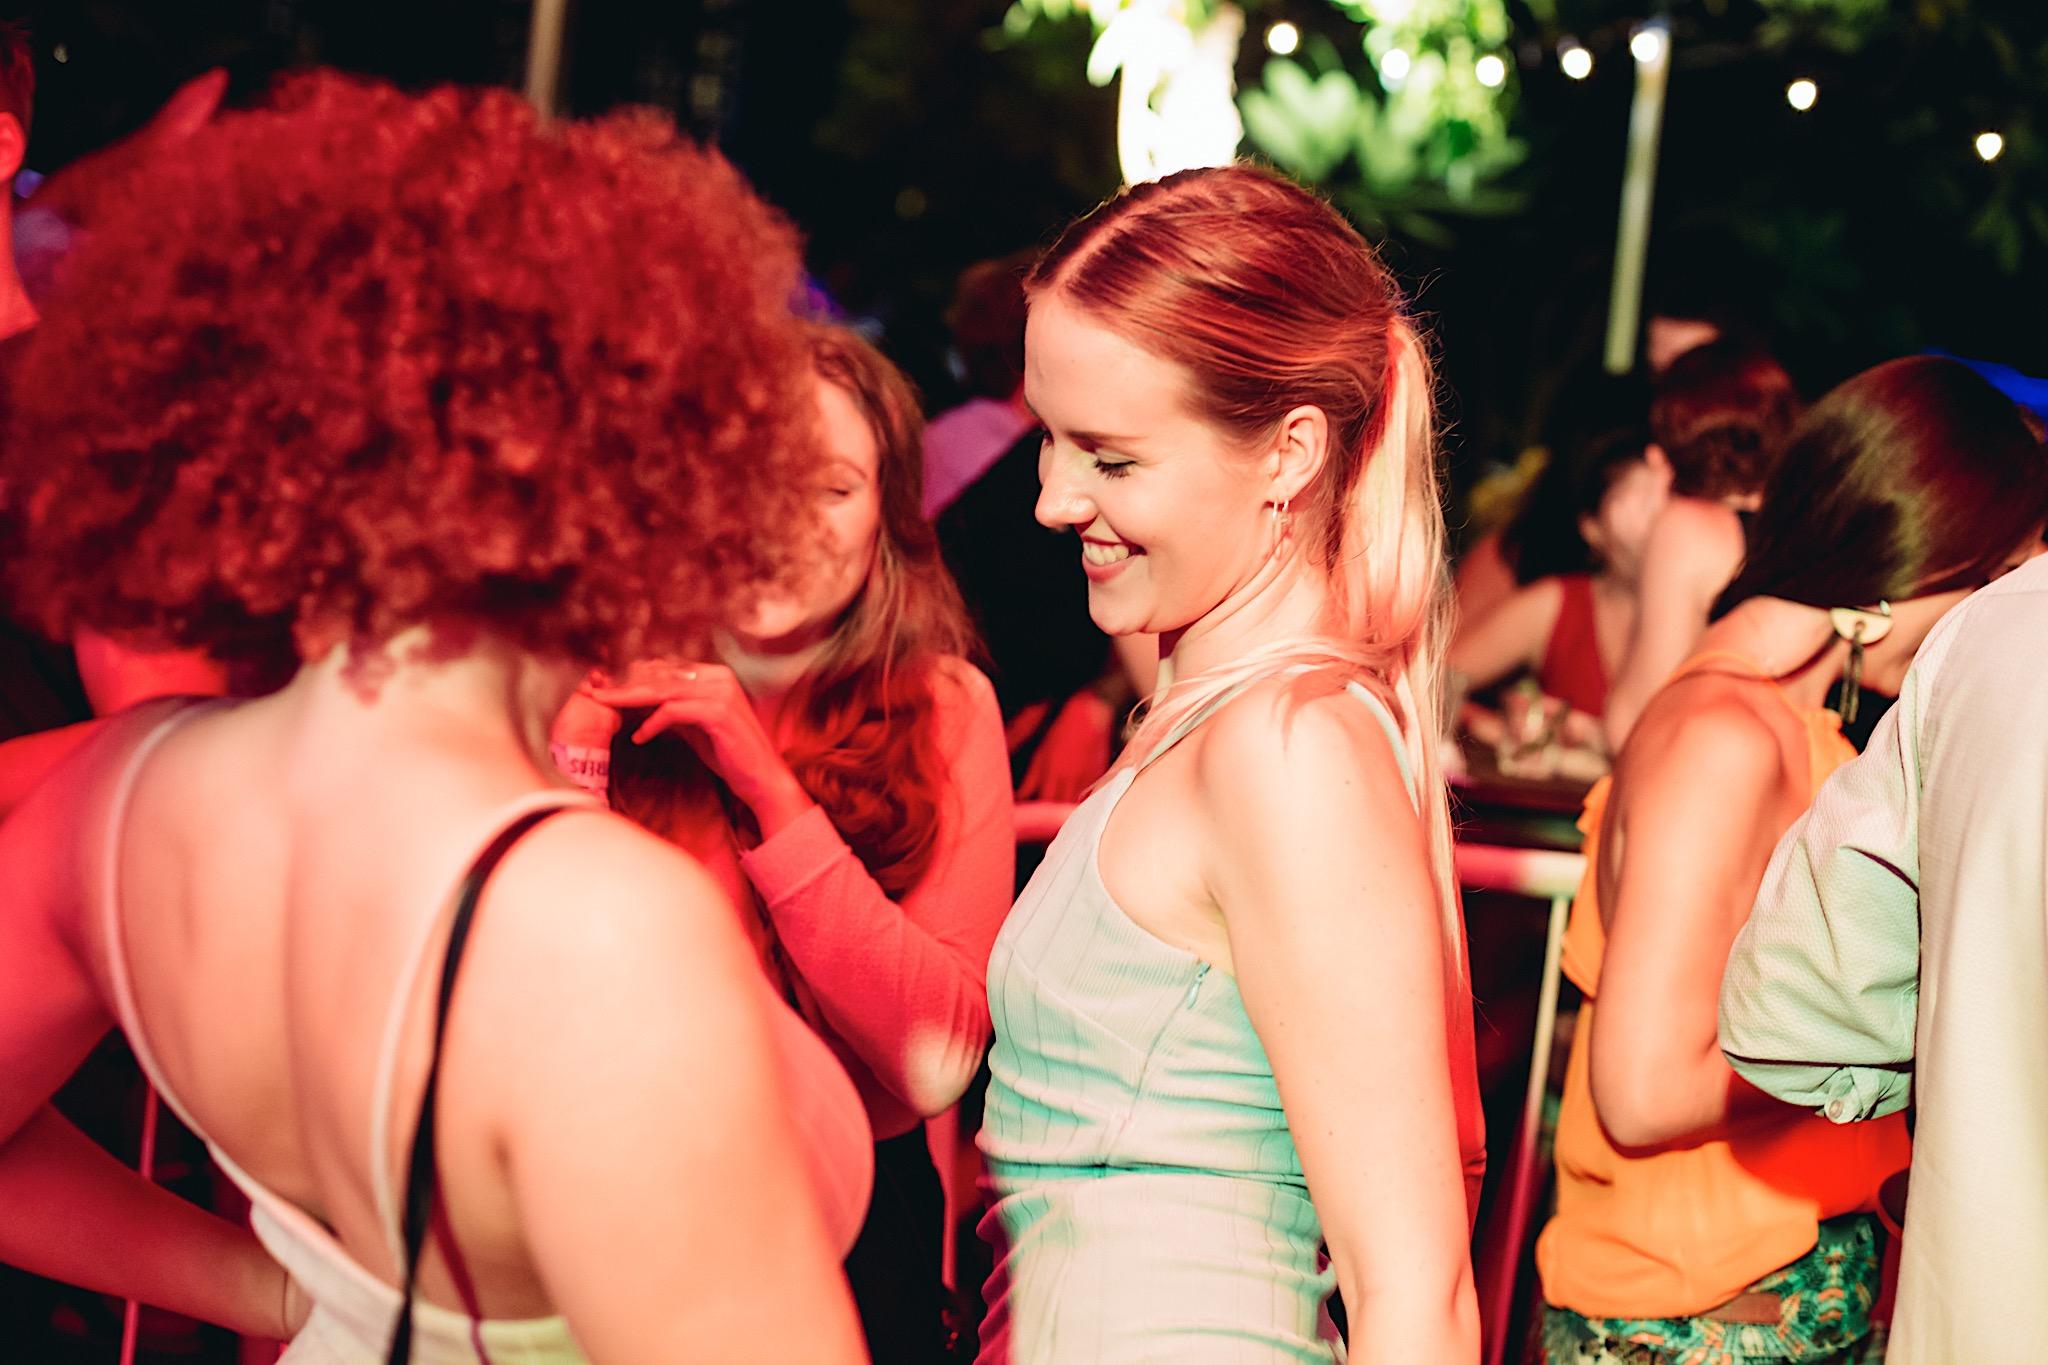 Gulity Pleasures Party Girls Dancing - OverEasy